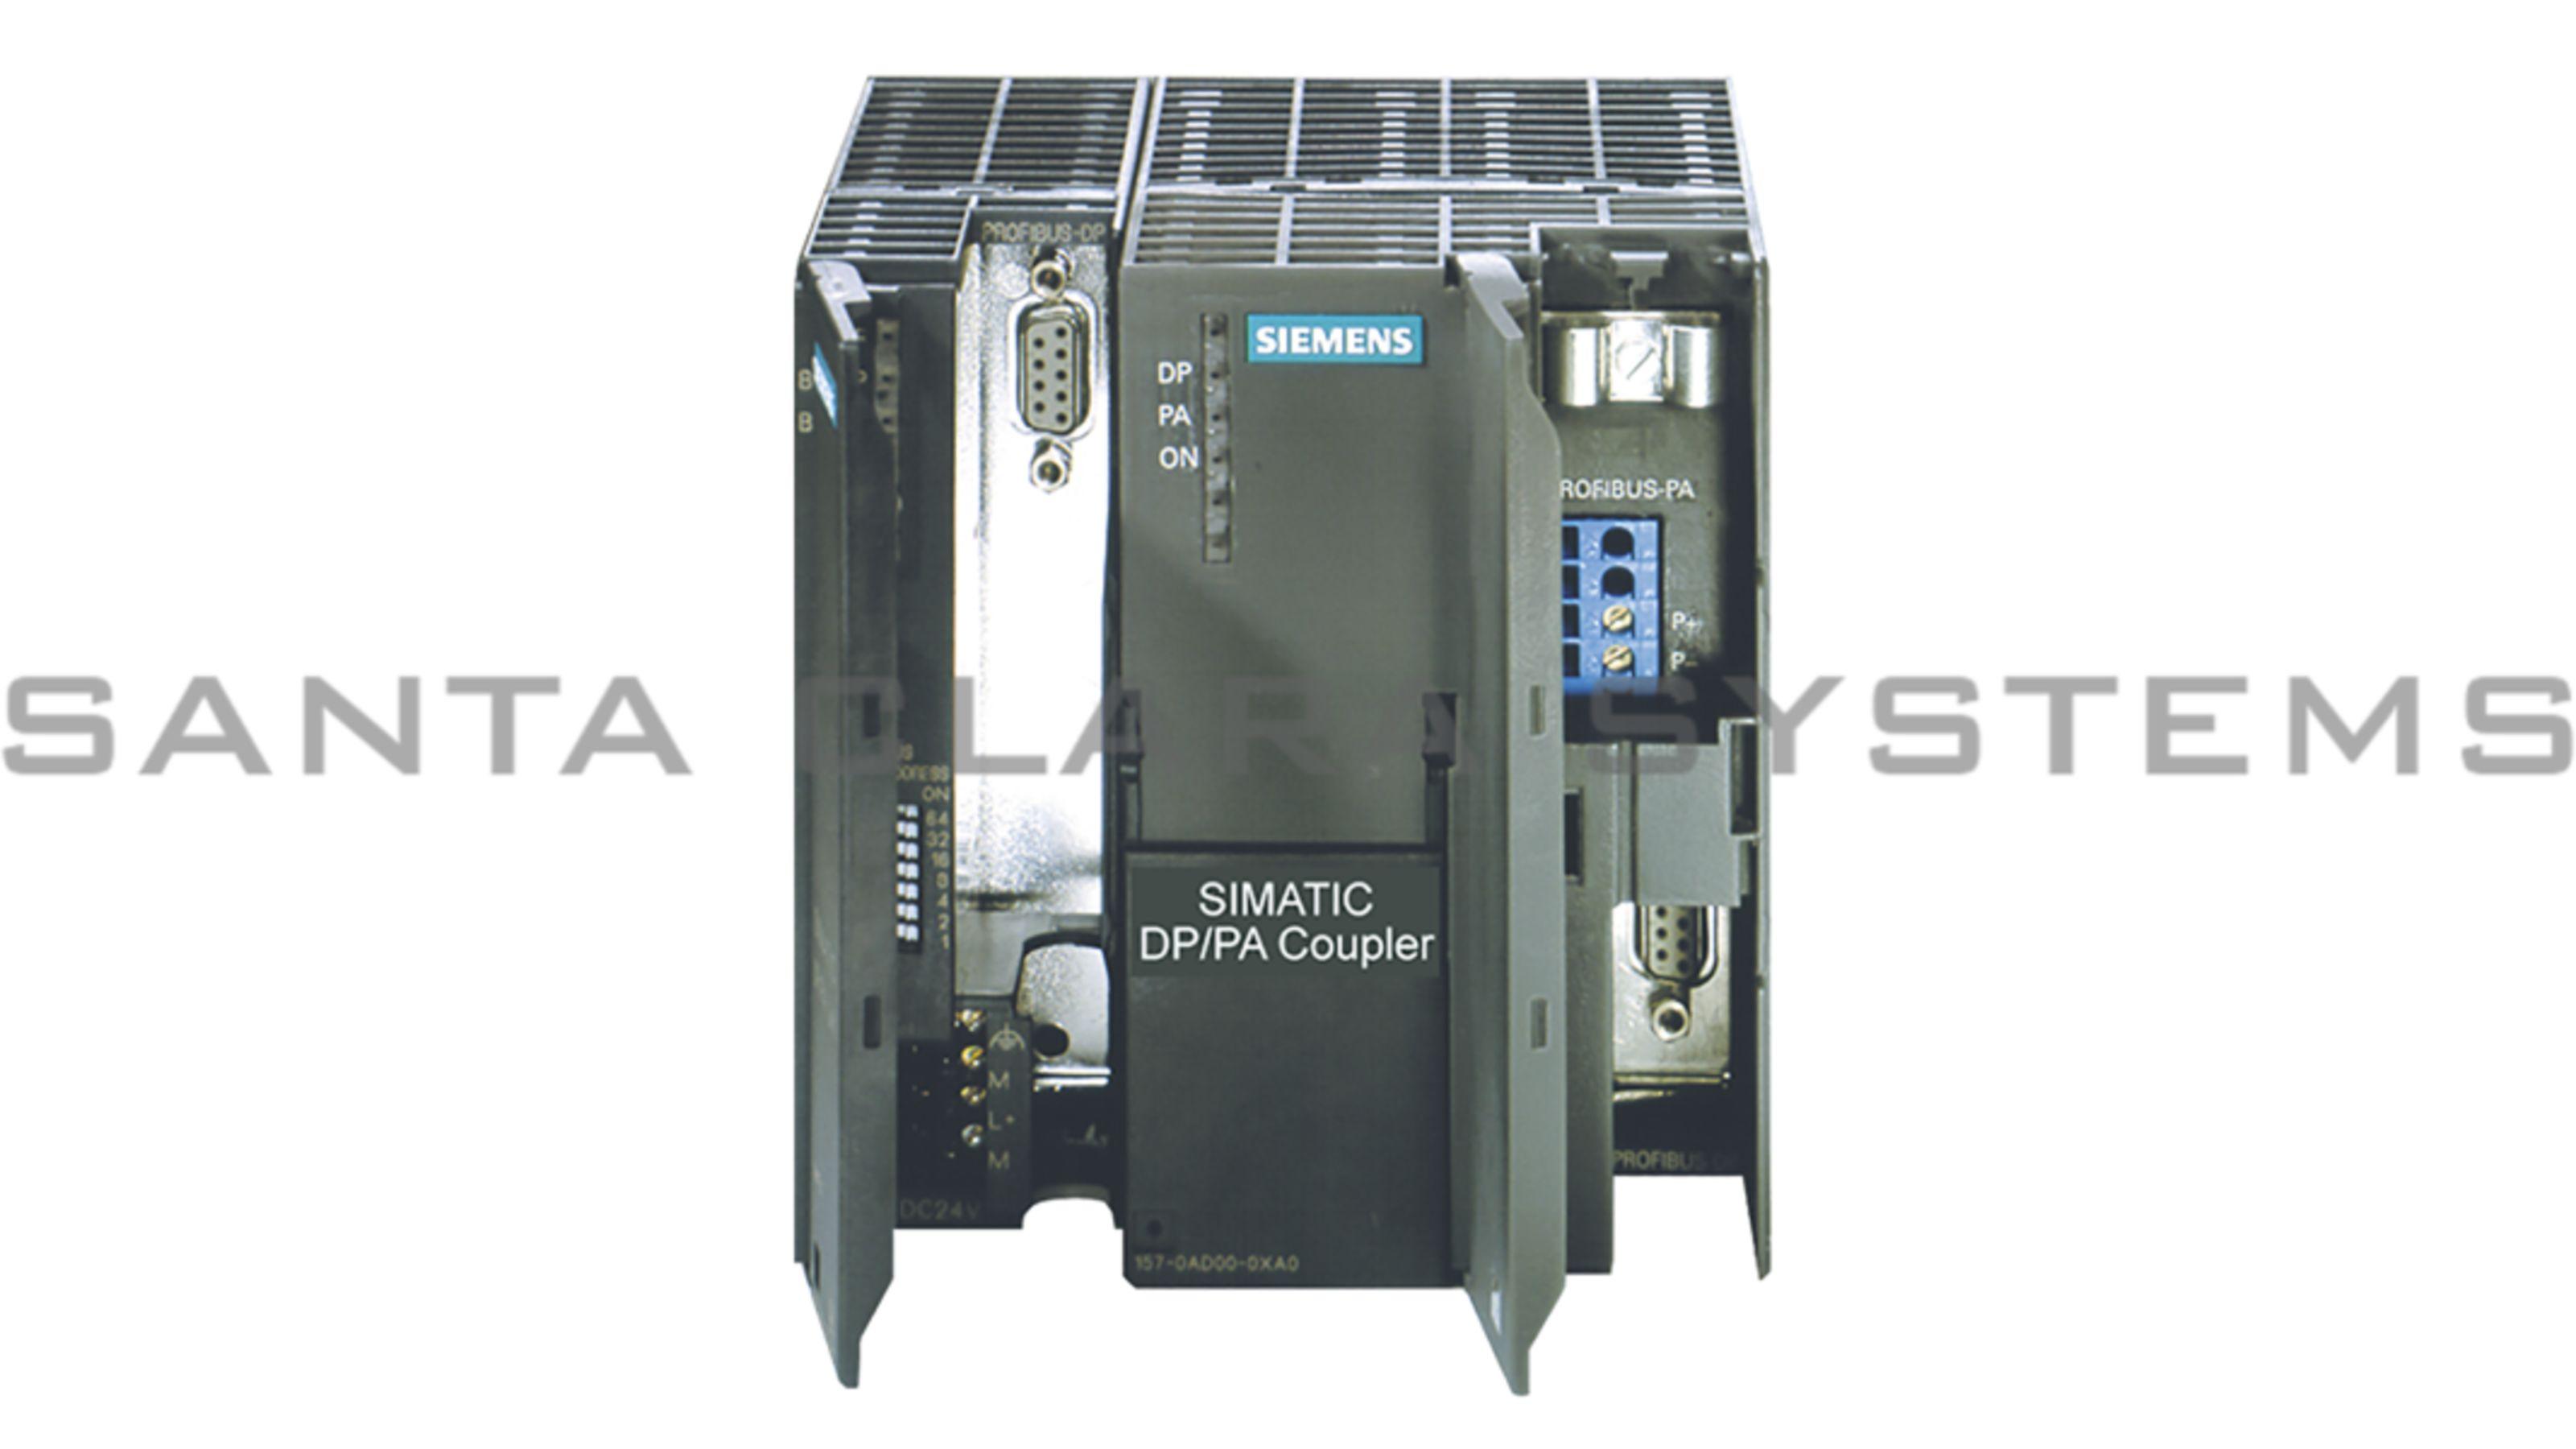 6es7157 0ad82 0xa0 Siemens Coupler Module Out Metal Detector 6es7 157 Product